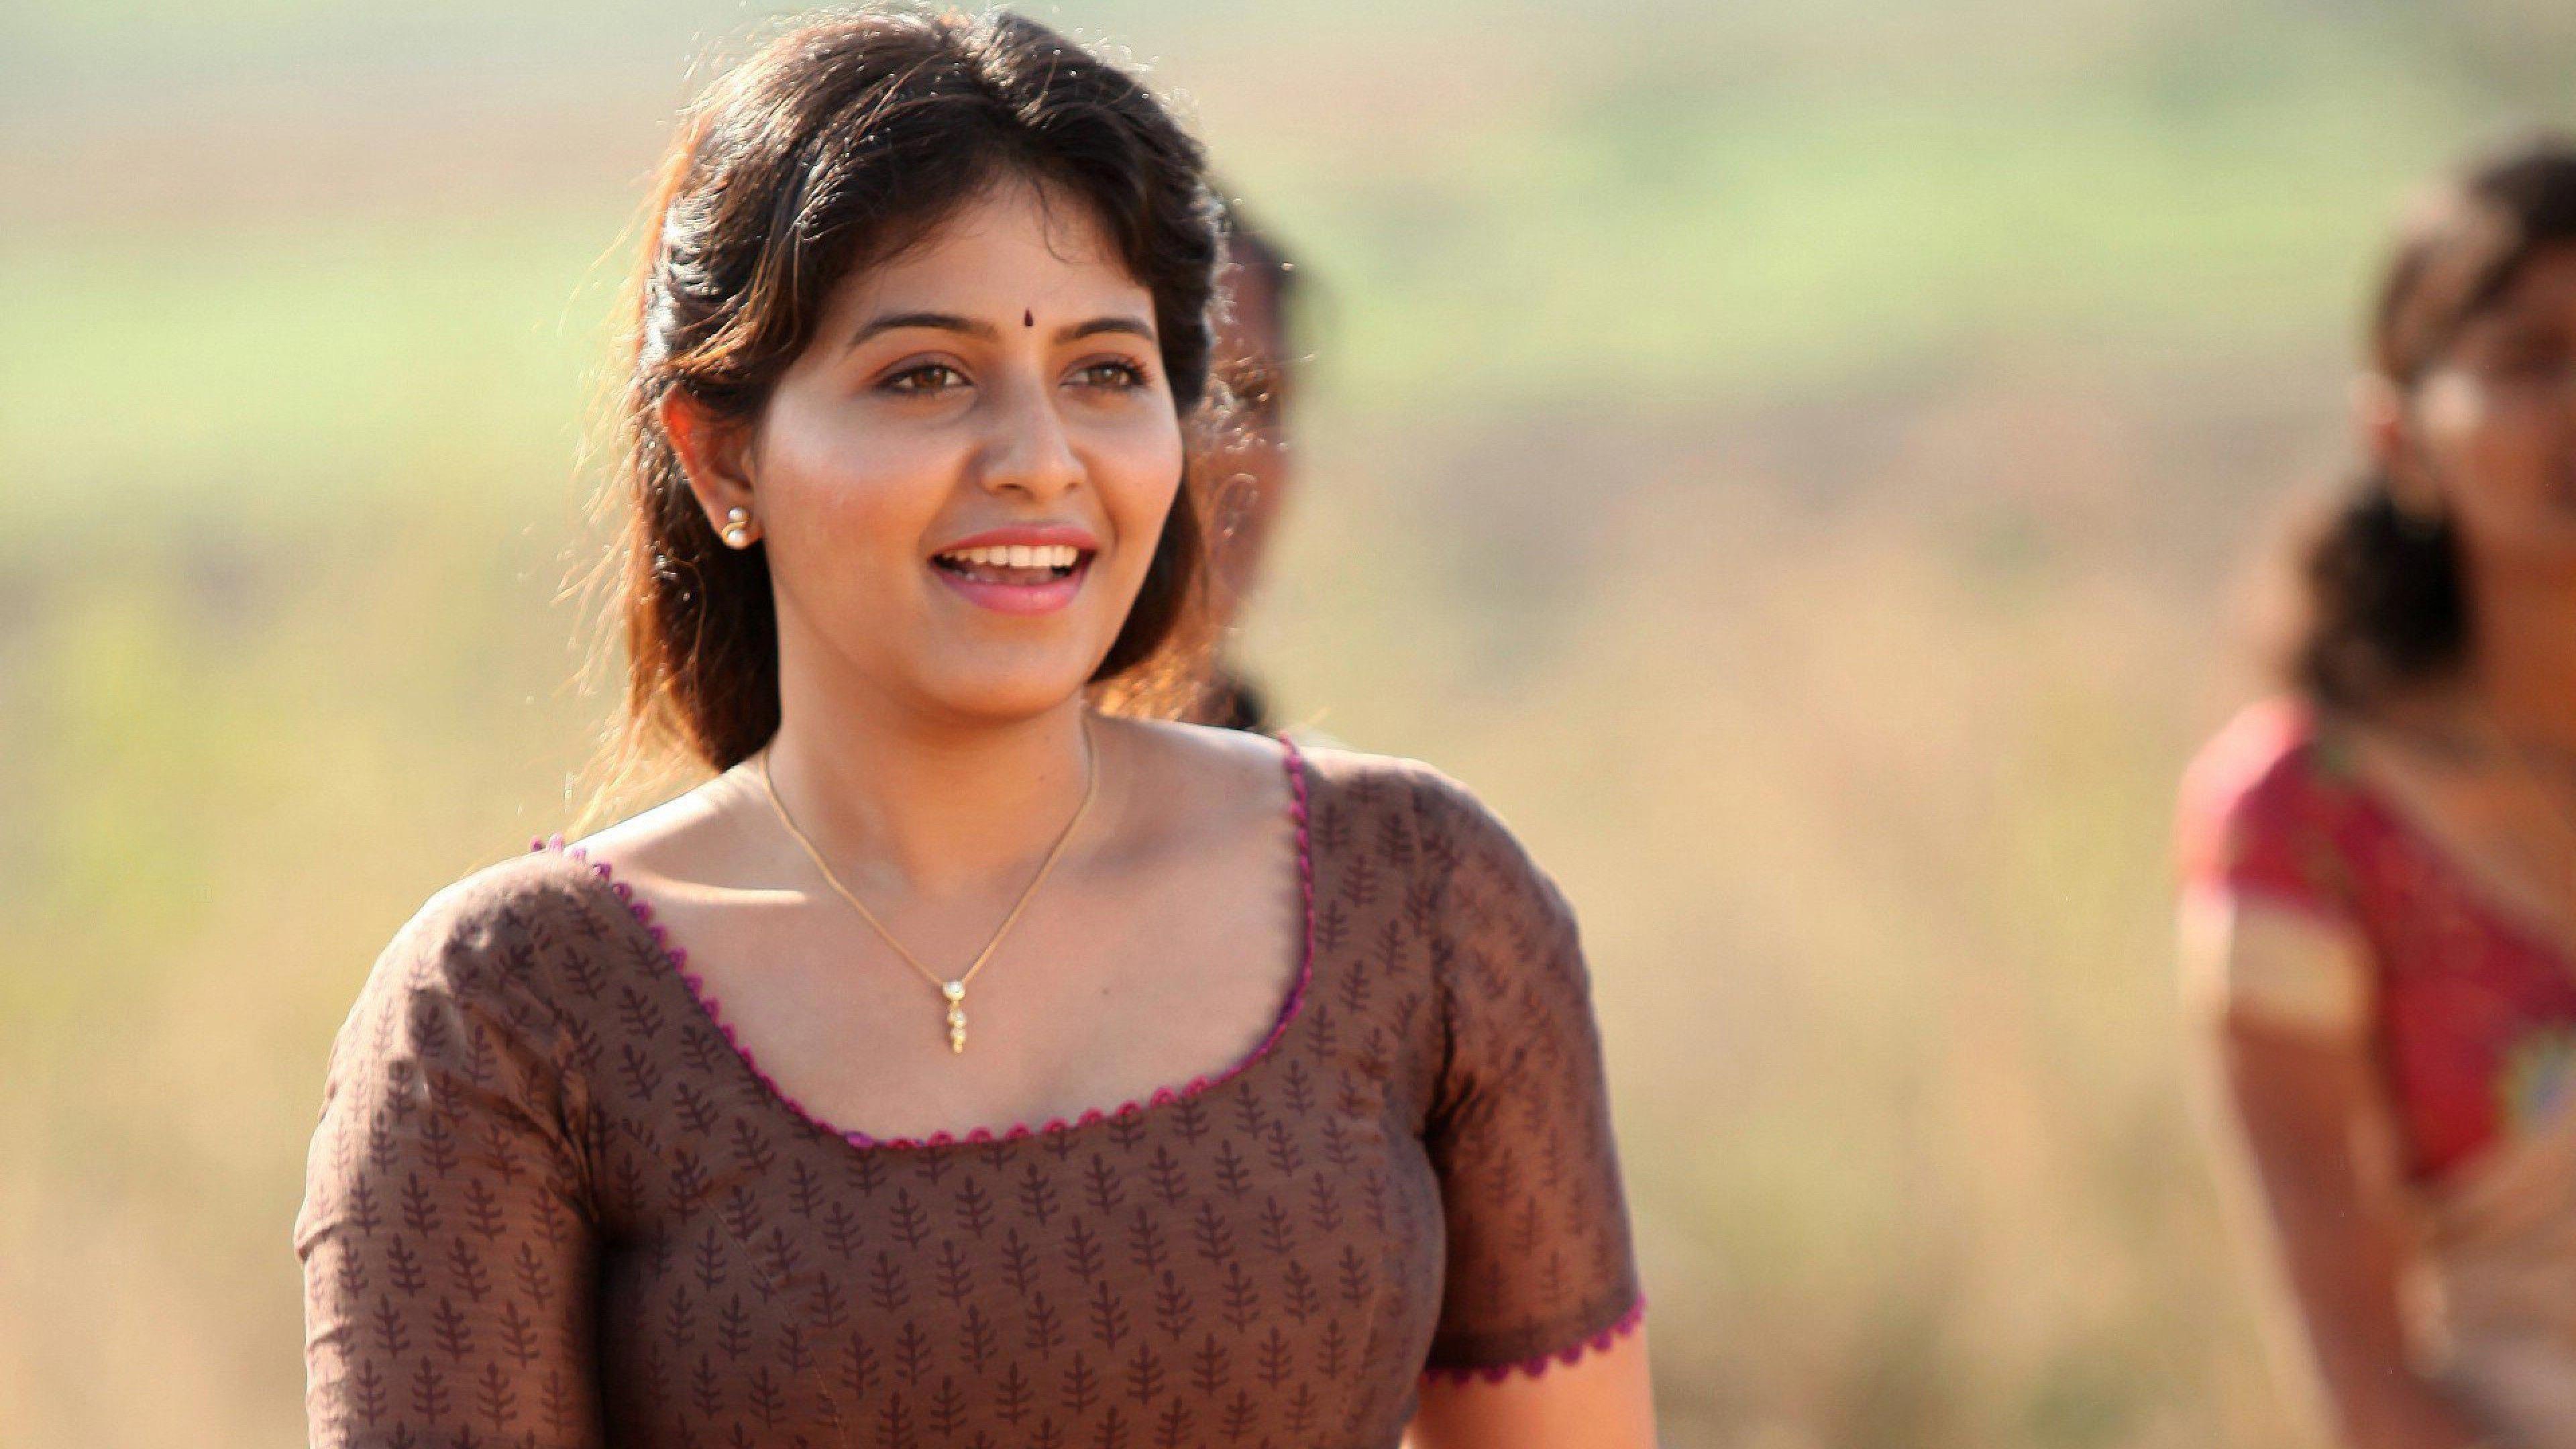 Anjali Tamil Actress Hd 4k Ultra Hd Wallpaper Hd 1080p Wallpaper Tamil Actress Actresses Indian Actresses